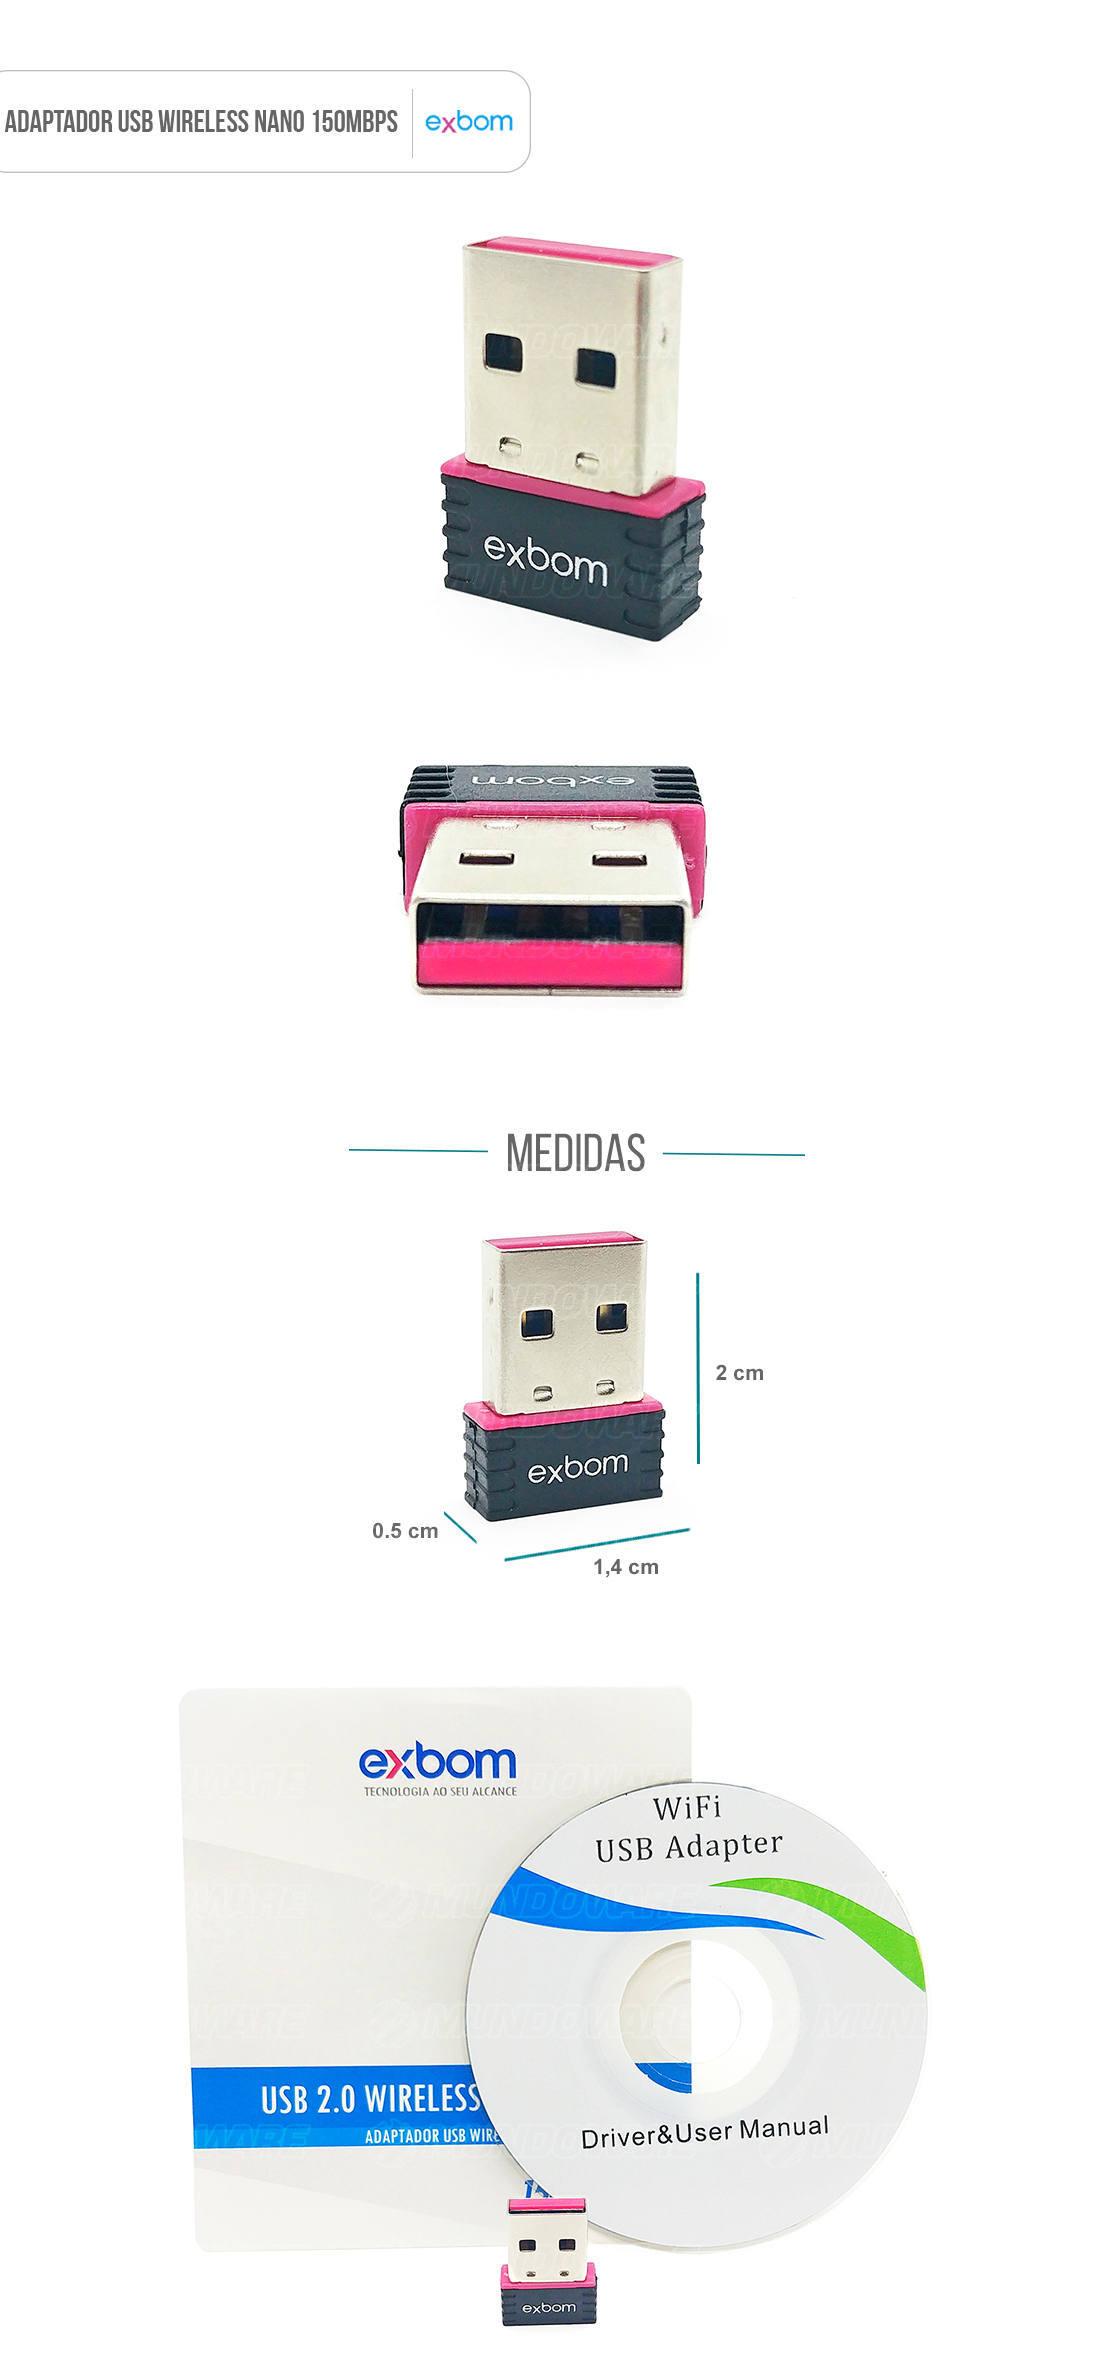 Adaptador Wireless USB Nano